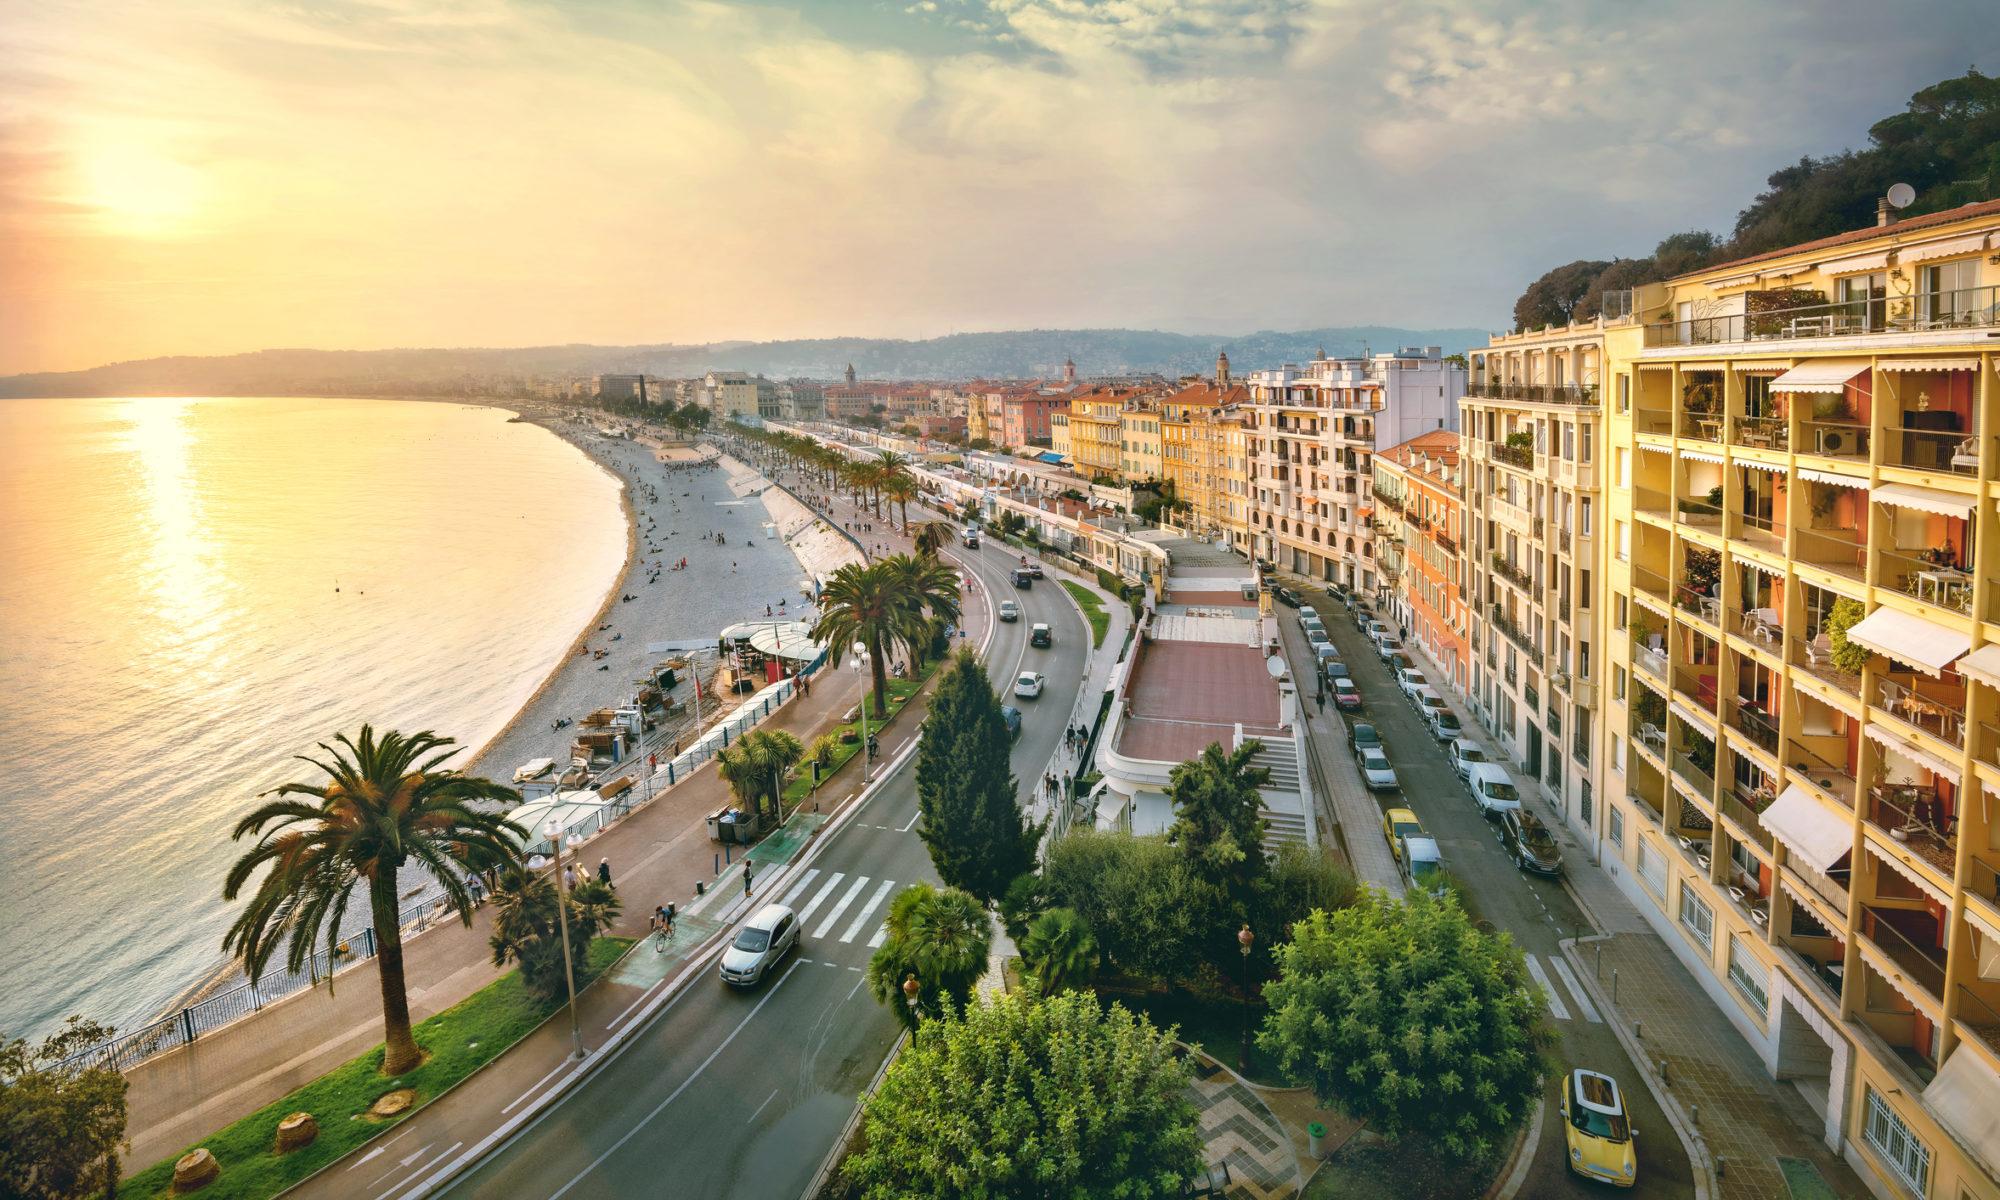 Investir à Nice grâce à la loi Pinel